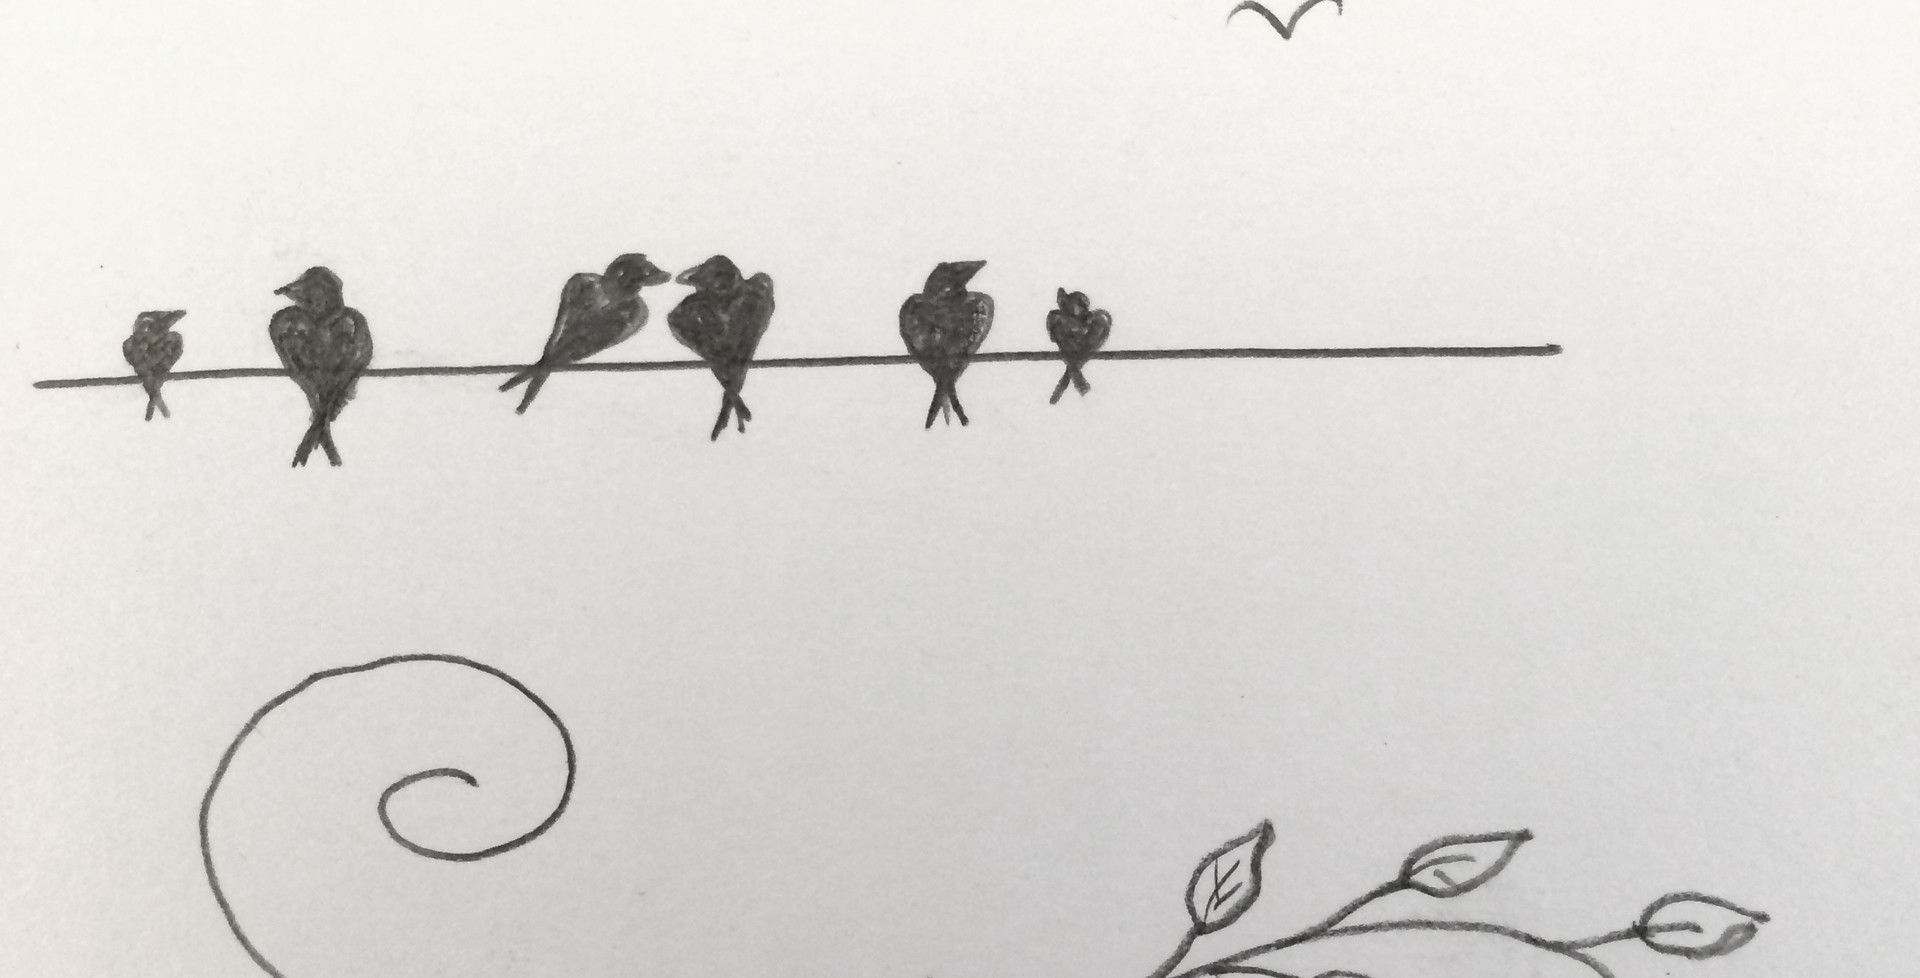 Sketchbook Page 29